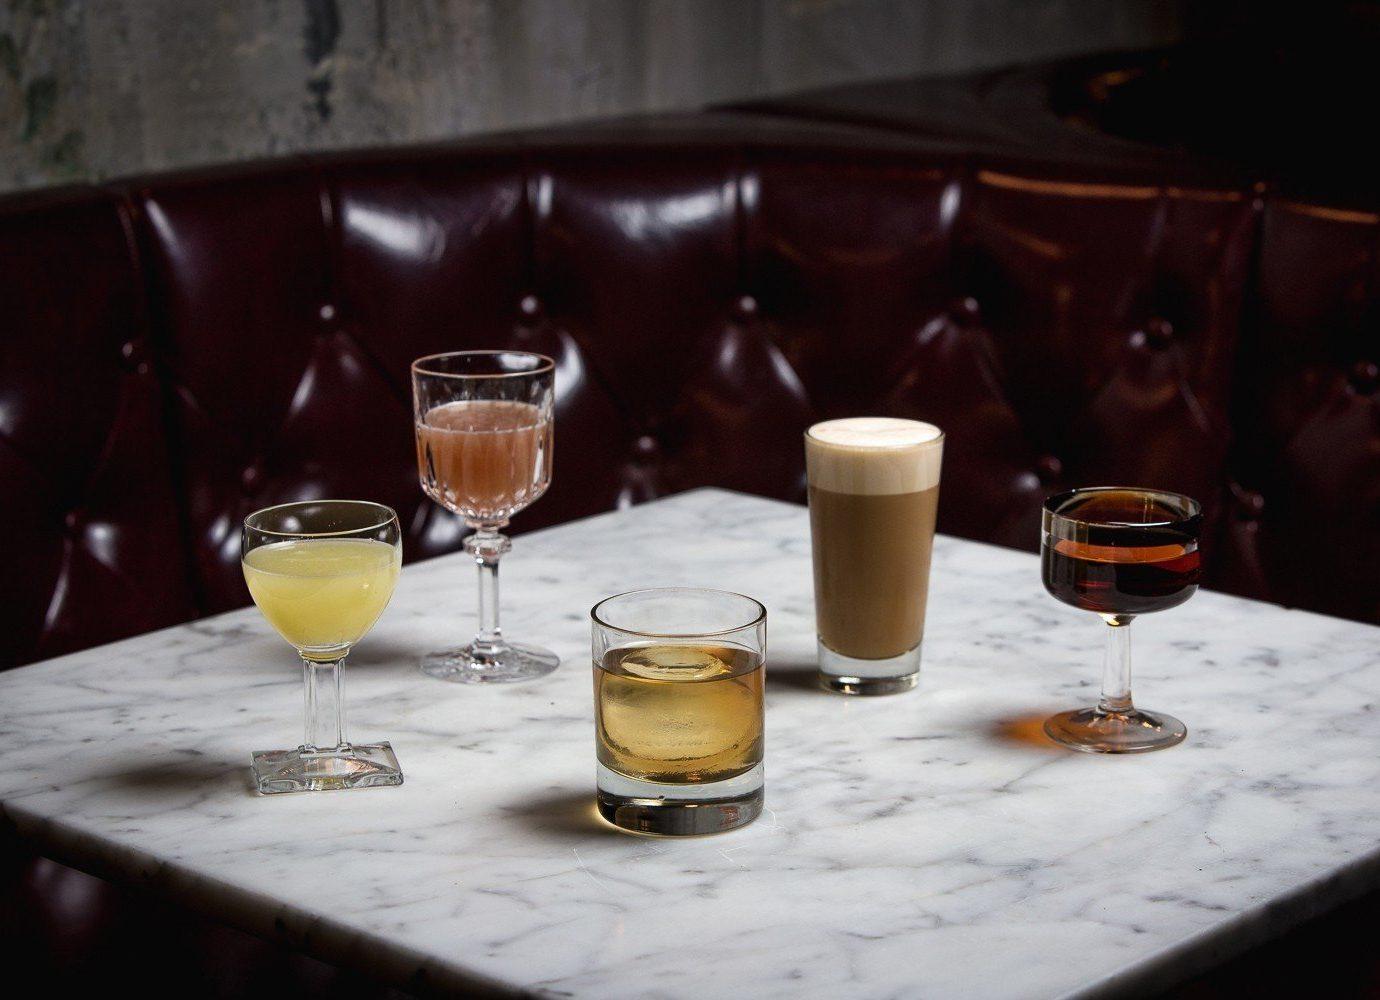 Trip Ideas table wine indoor glass Drink alcoholic beverage distilled beverage lighting meal restaurant Bar drinking